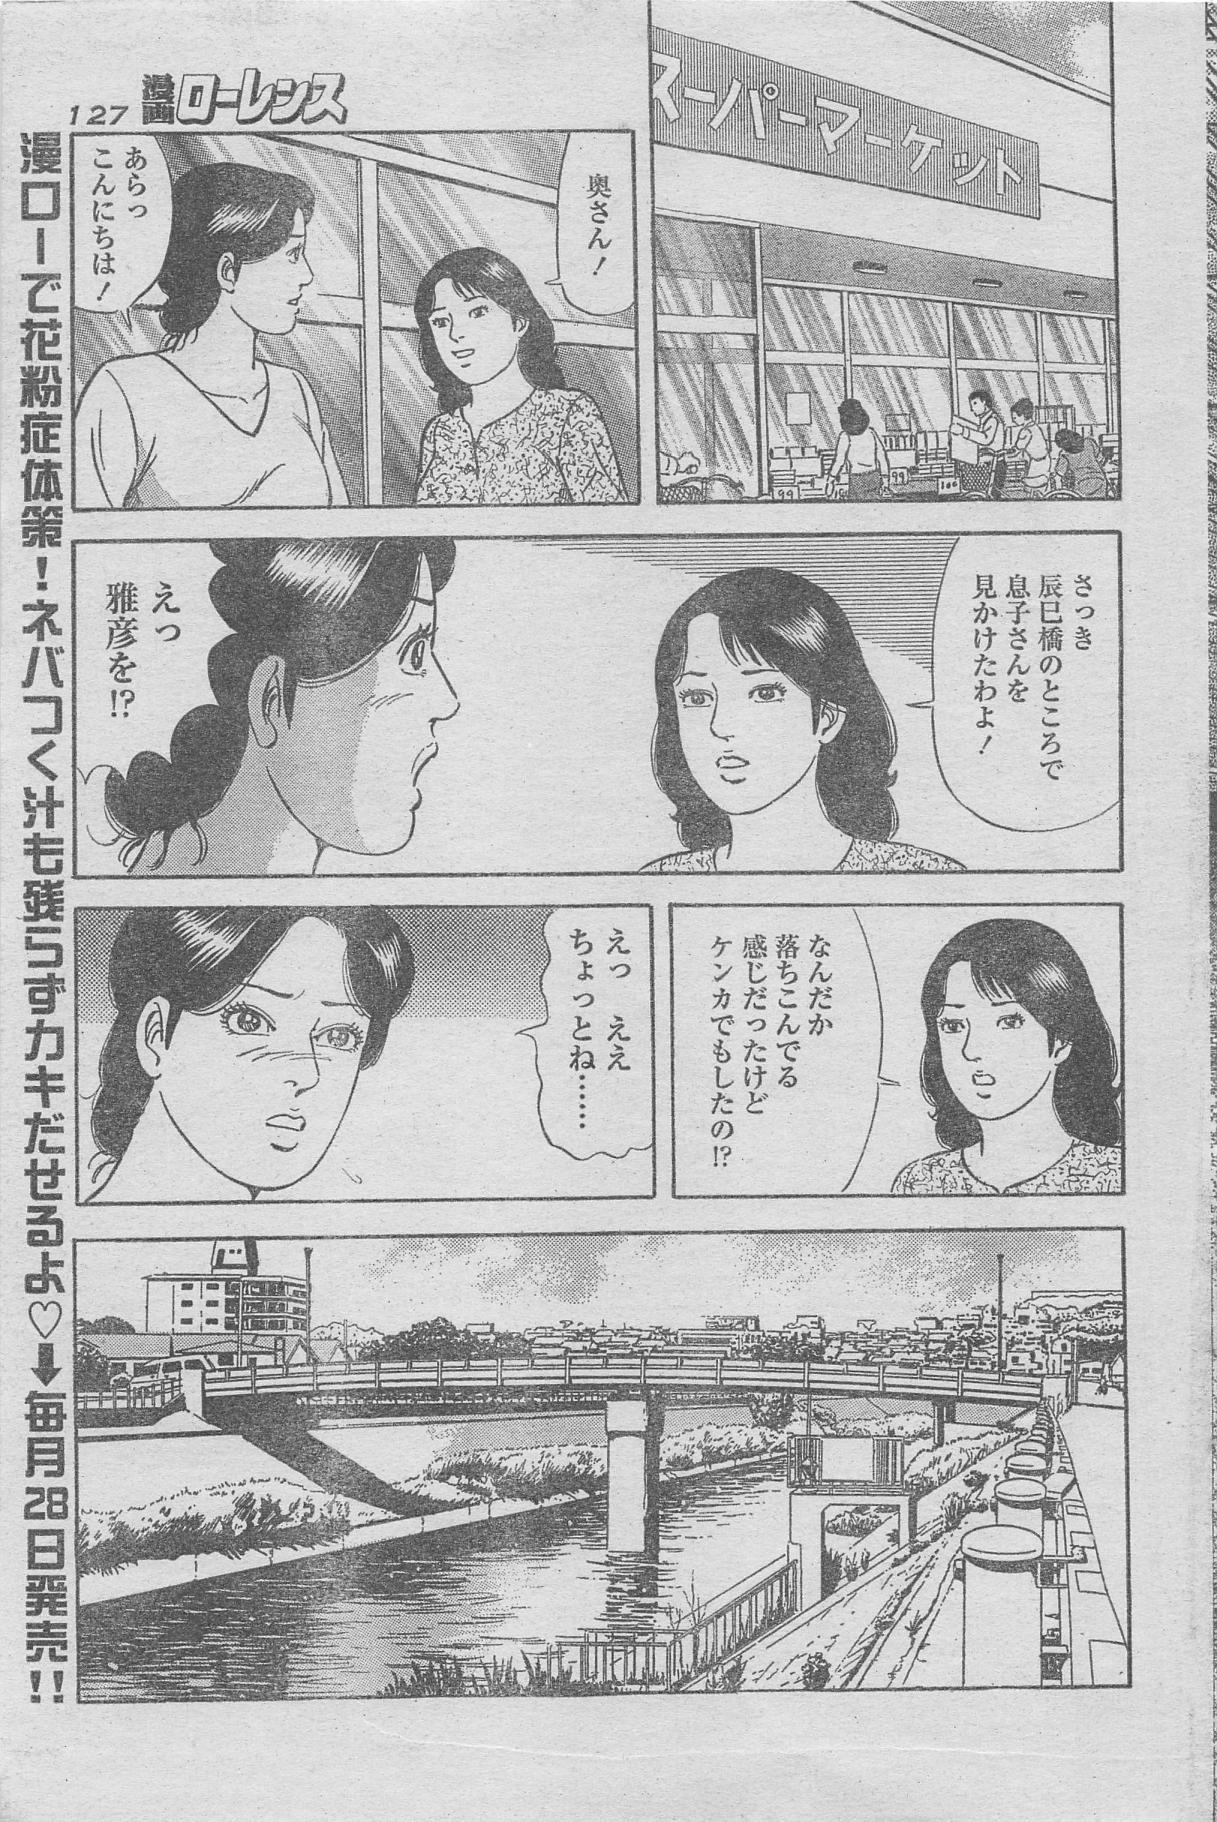 Manga Lawrence 2013-04 114